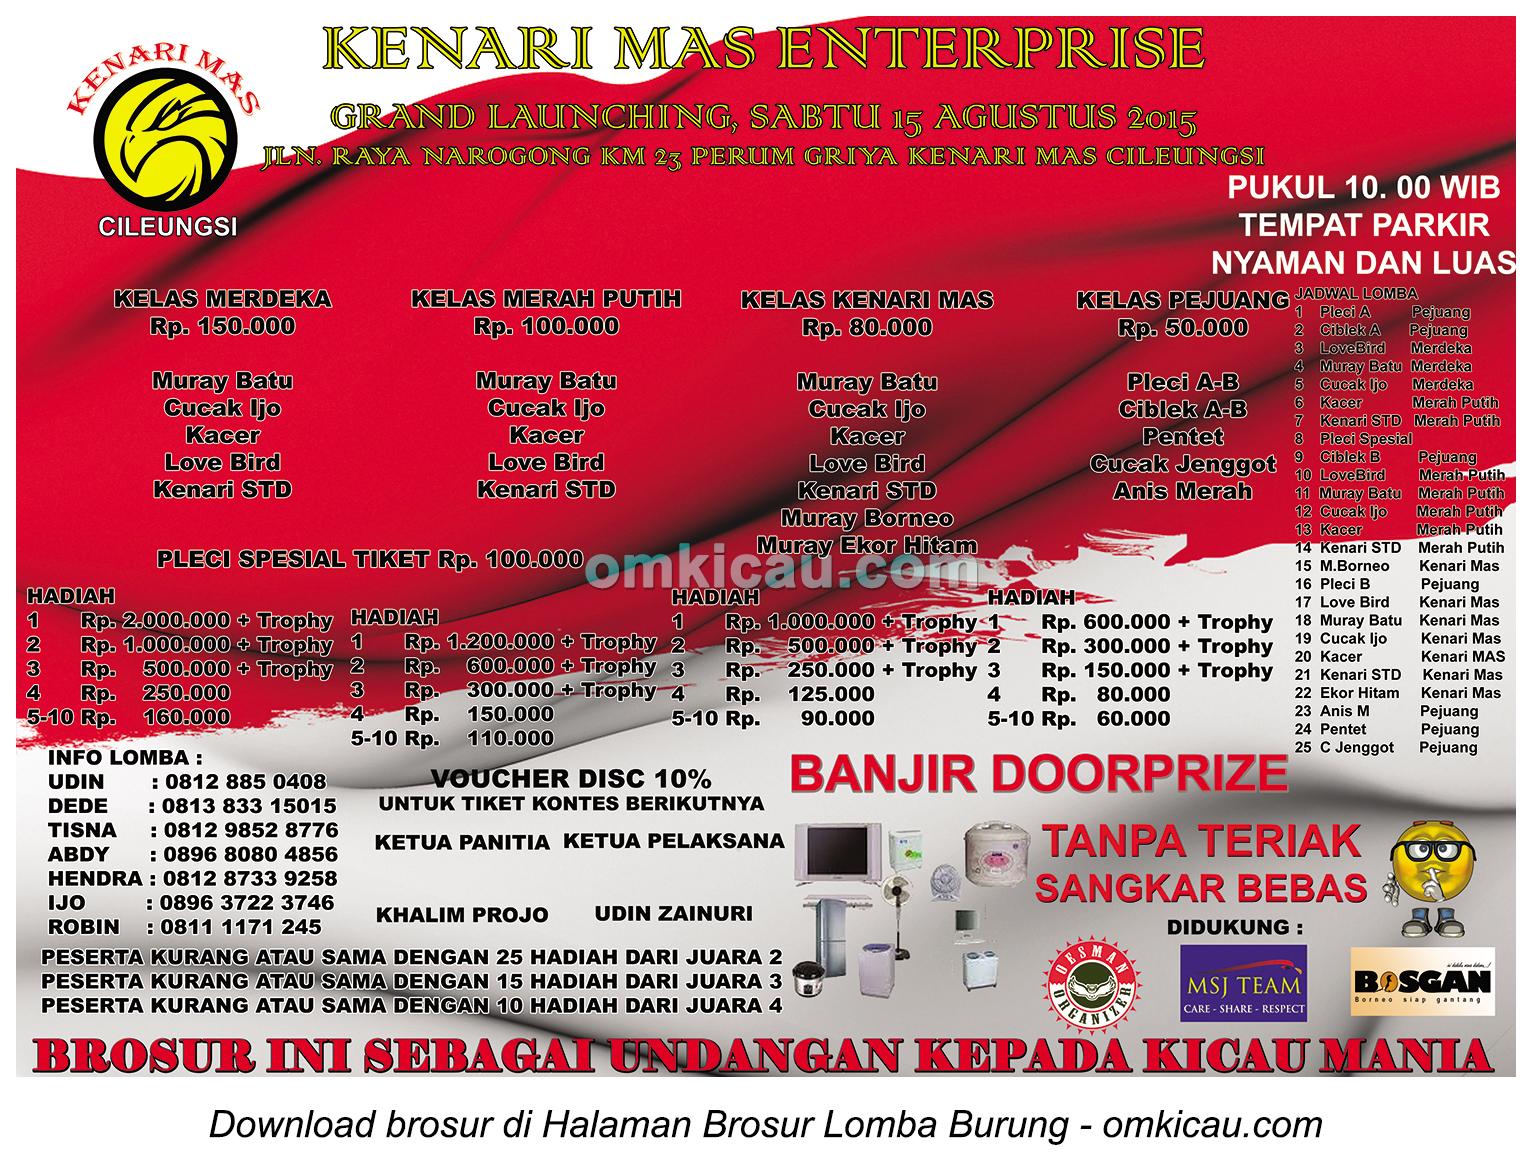 Brosur Lomba Burung Berkicau Grand Launching Kenari Mas Enterprise, Cileungsi, 15 Agustus 2015